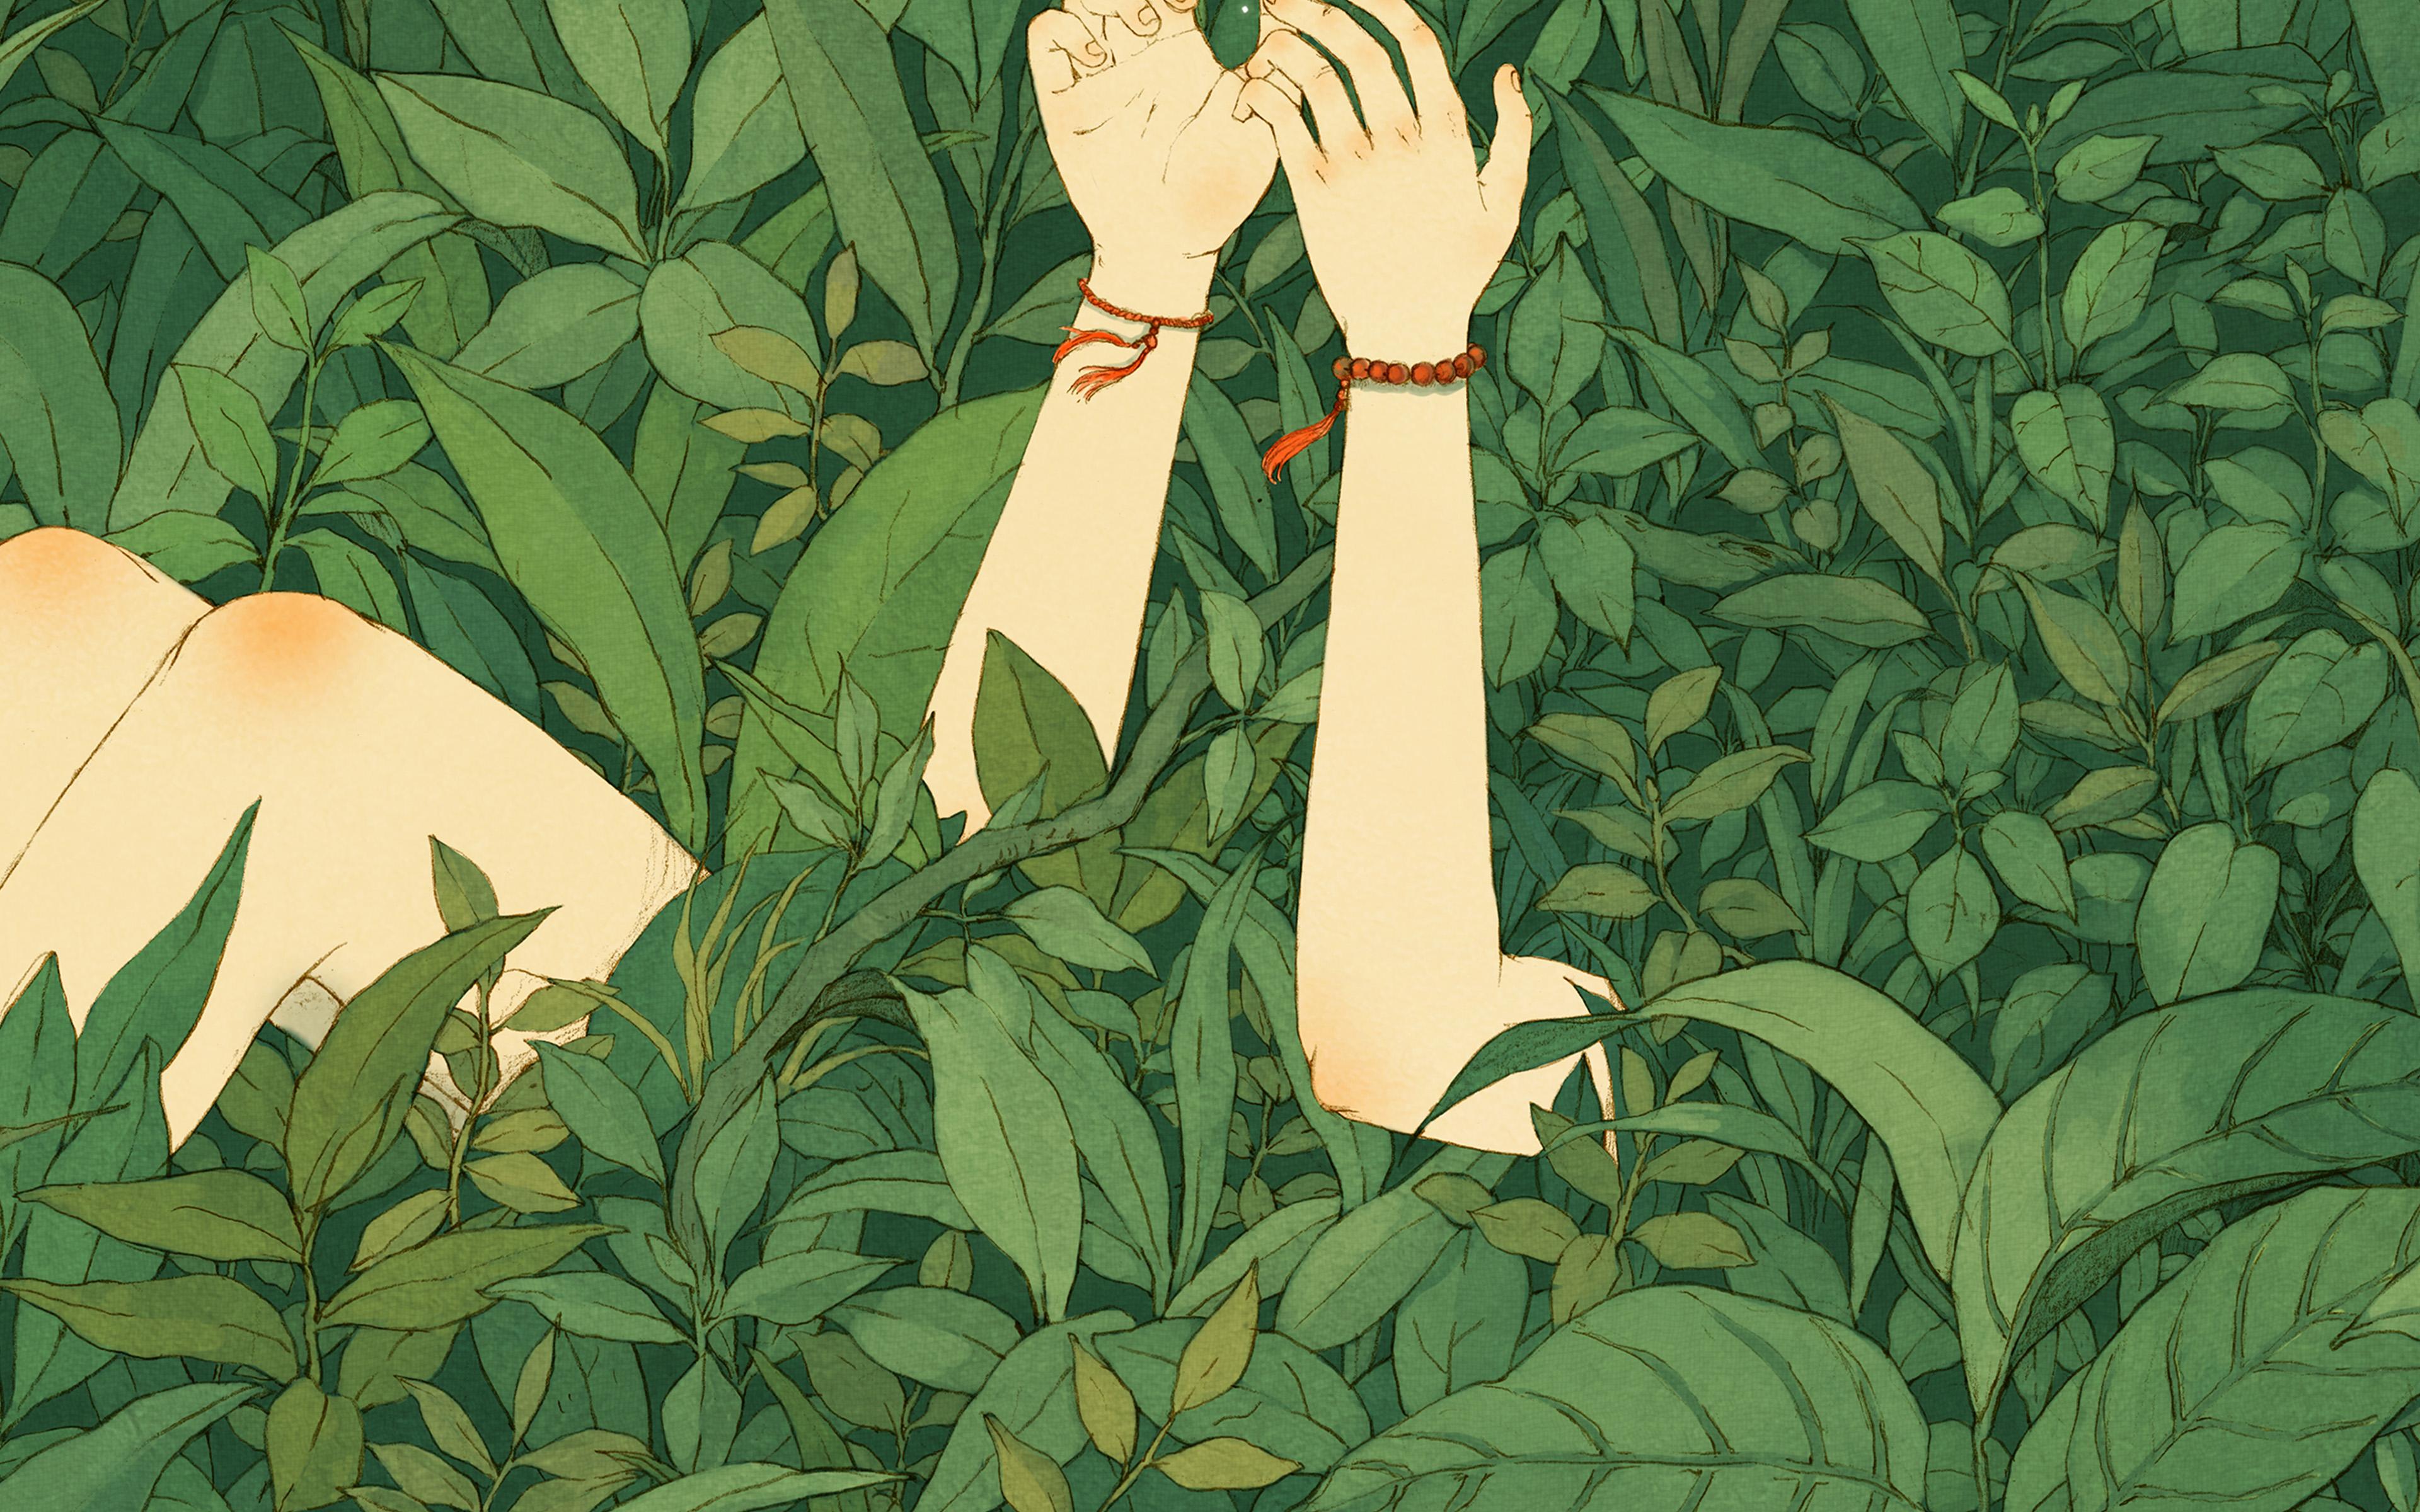 Ay83 Green Wood Forest Love Butterfly Illustration Art Wallpaper